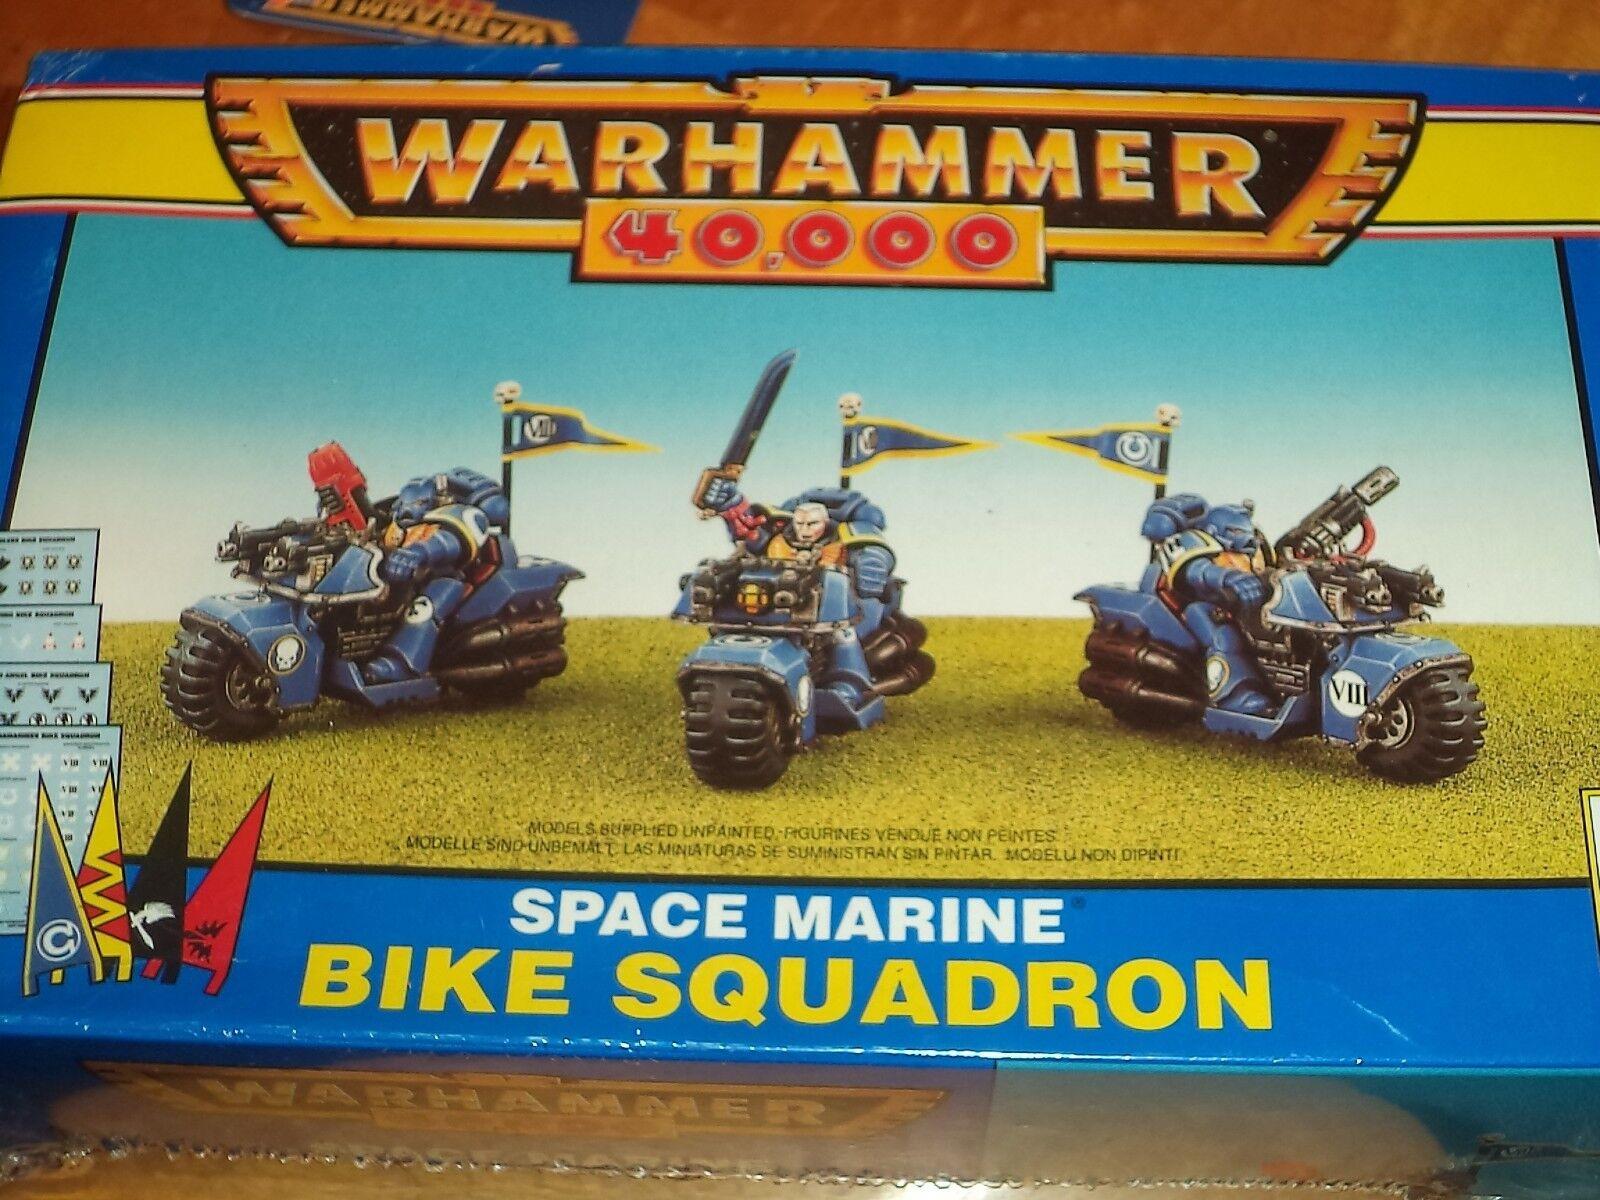 Space Marine Bike Squadron Squad Warhammer 40k 40,000 Games Workshop Model New